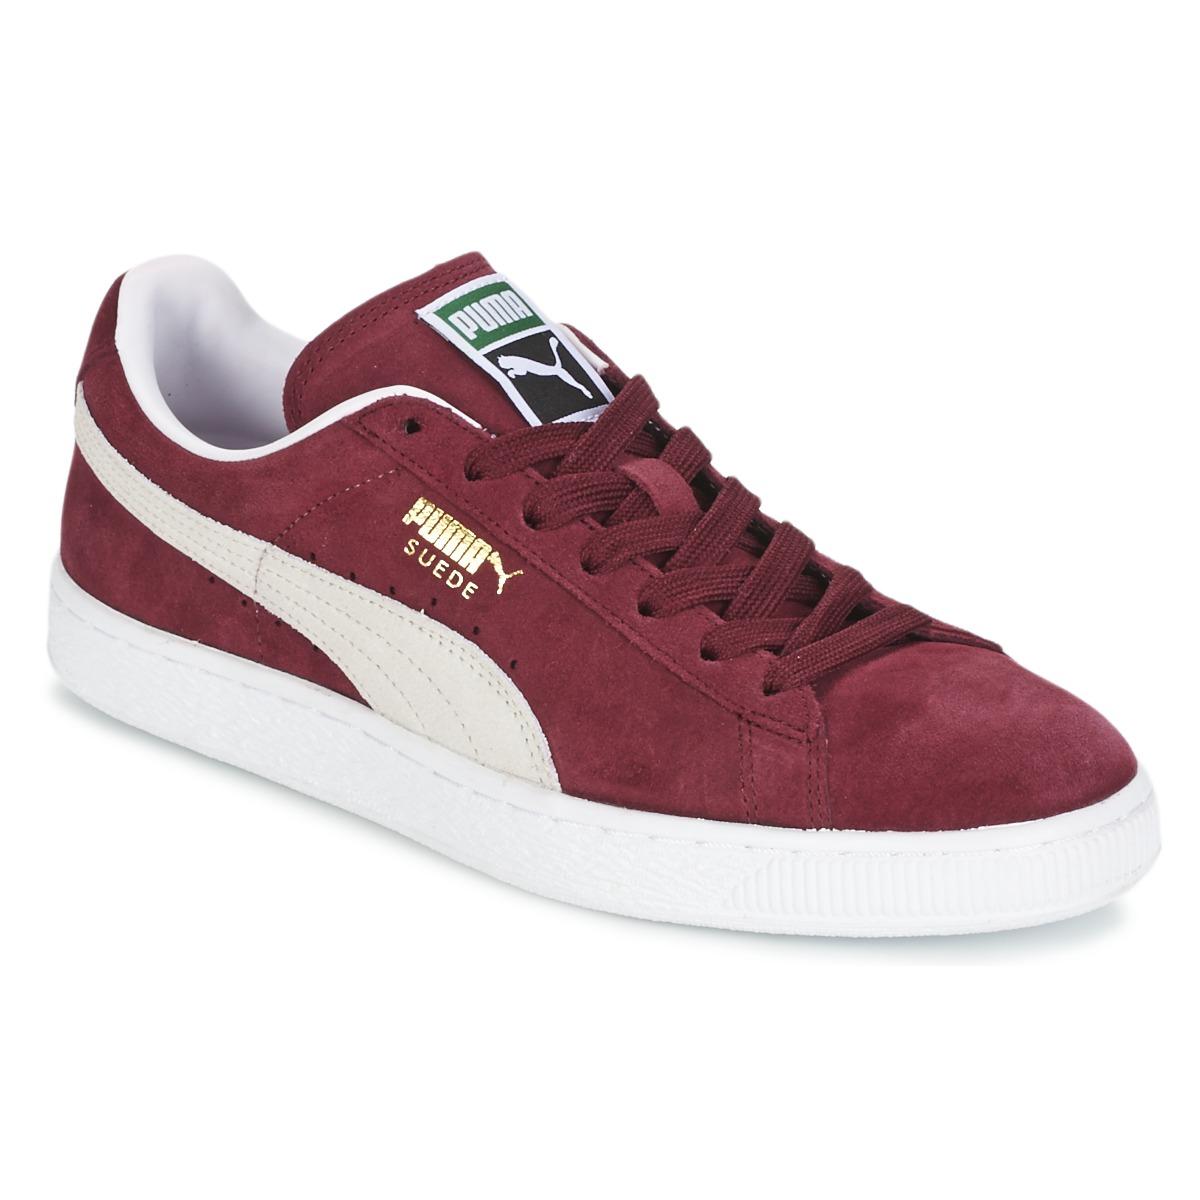 Puma SUEDE CLASSIC Rot / Weiss - Kostenloser Versand bei Spartoode ! - Schuhe Sneaker Low  67,99 €